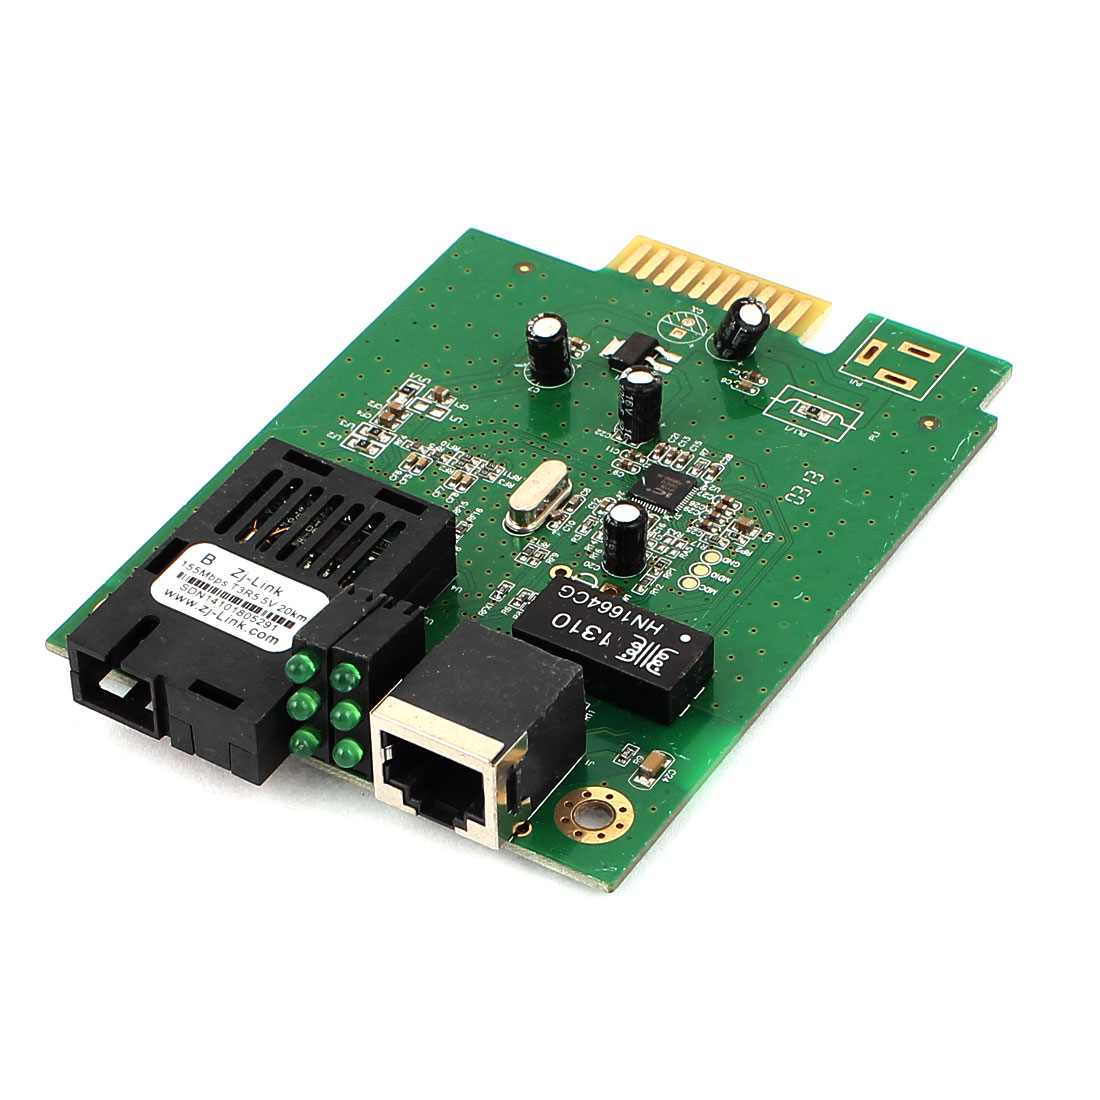 Single WDM 25Km Fast Ethernet 10/100 Optical Fiber Converter Board